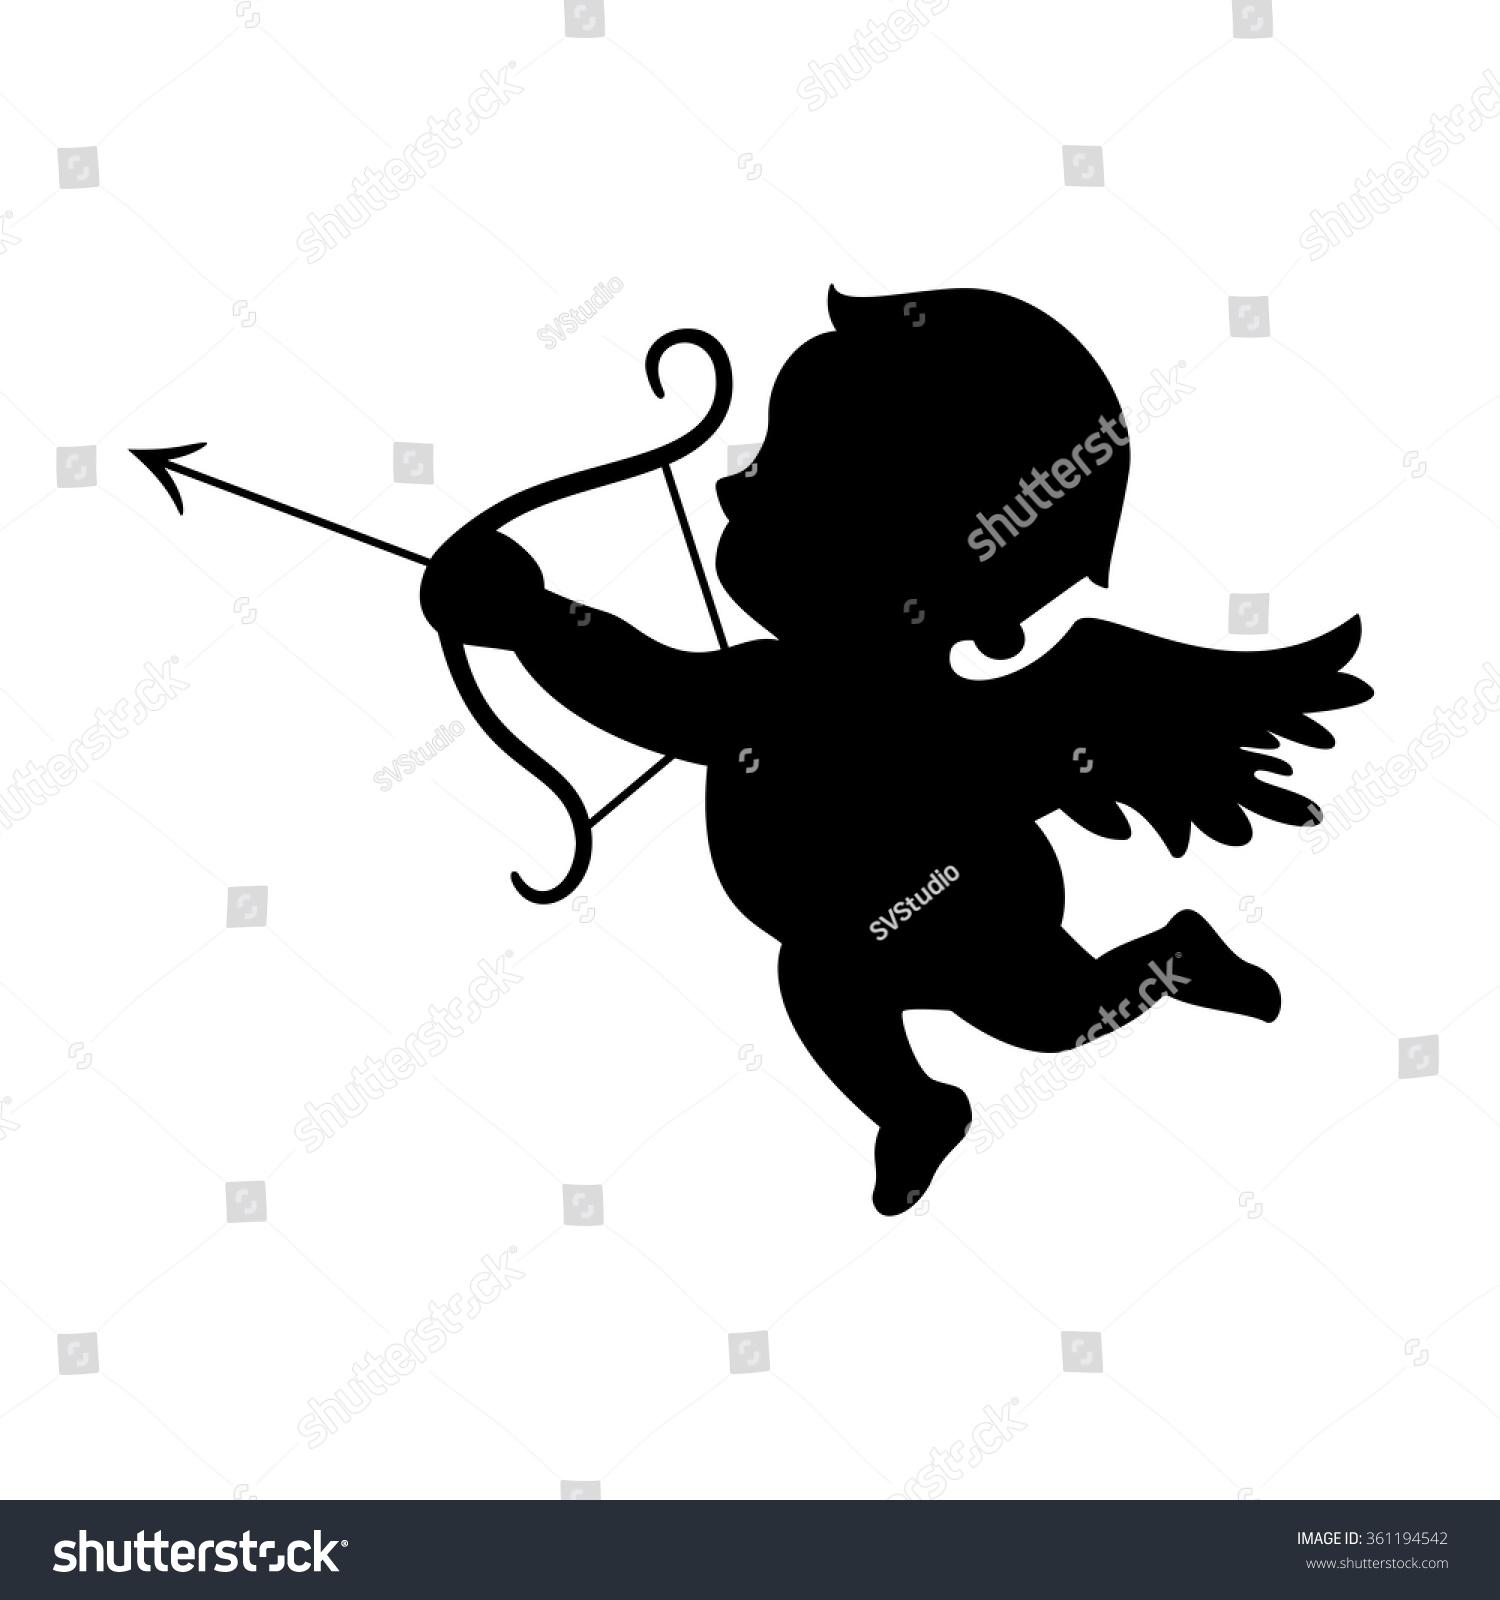 cupid black silhouette valentines day symbol stock vector